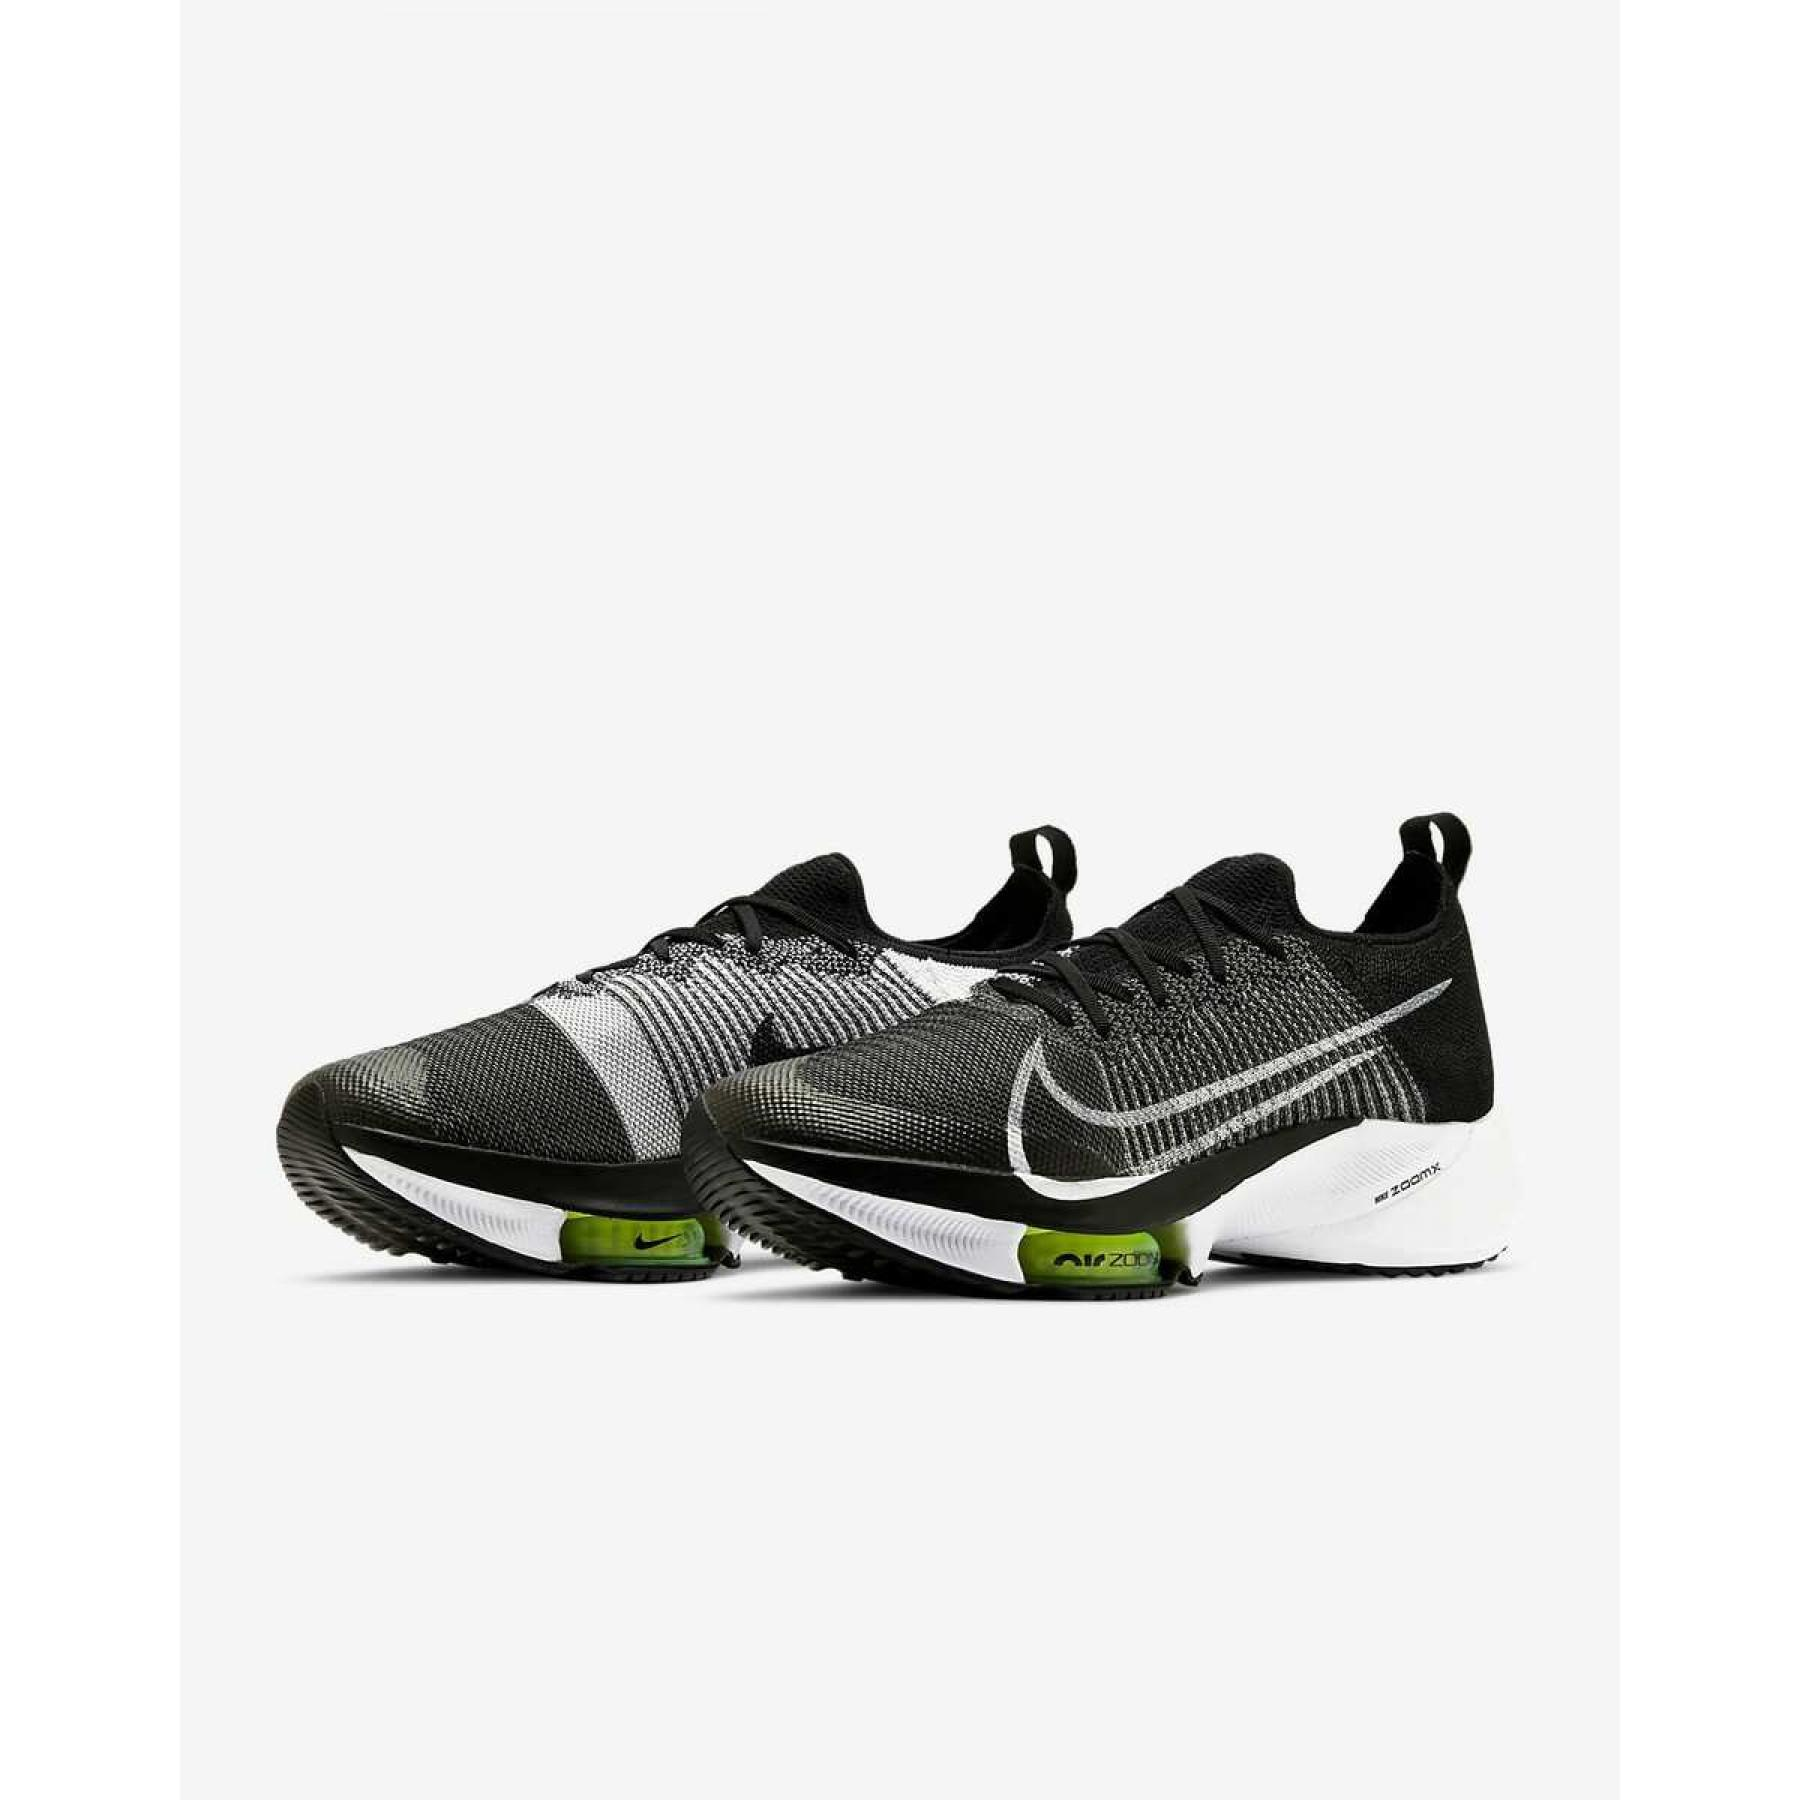 Zapatillas Nike Air Zoom Tempo NEXT%.